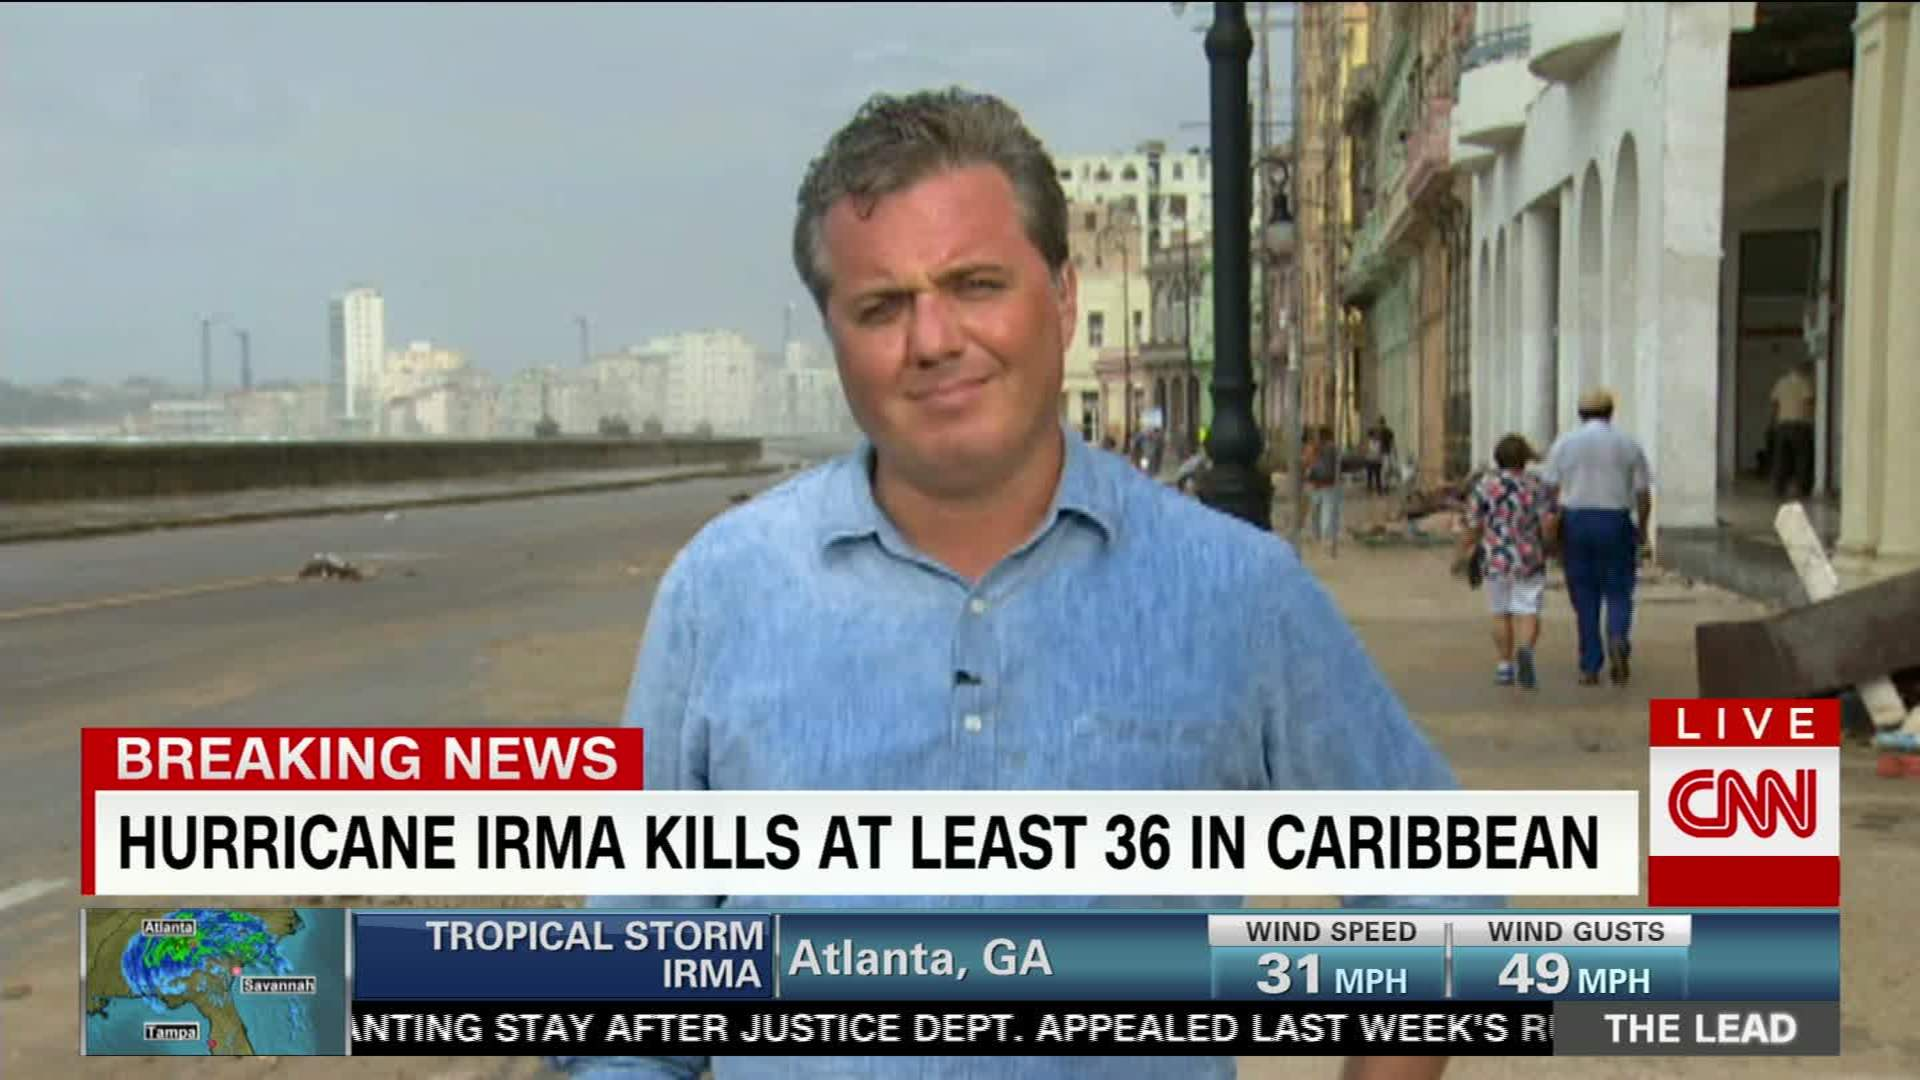 Irma wreaks havoc in Caribbean